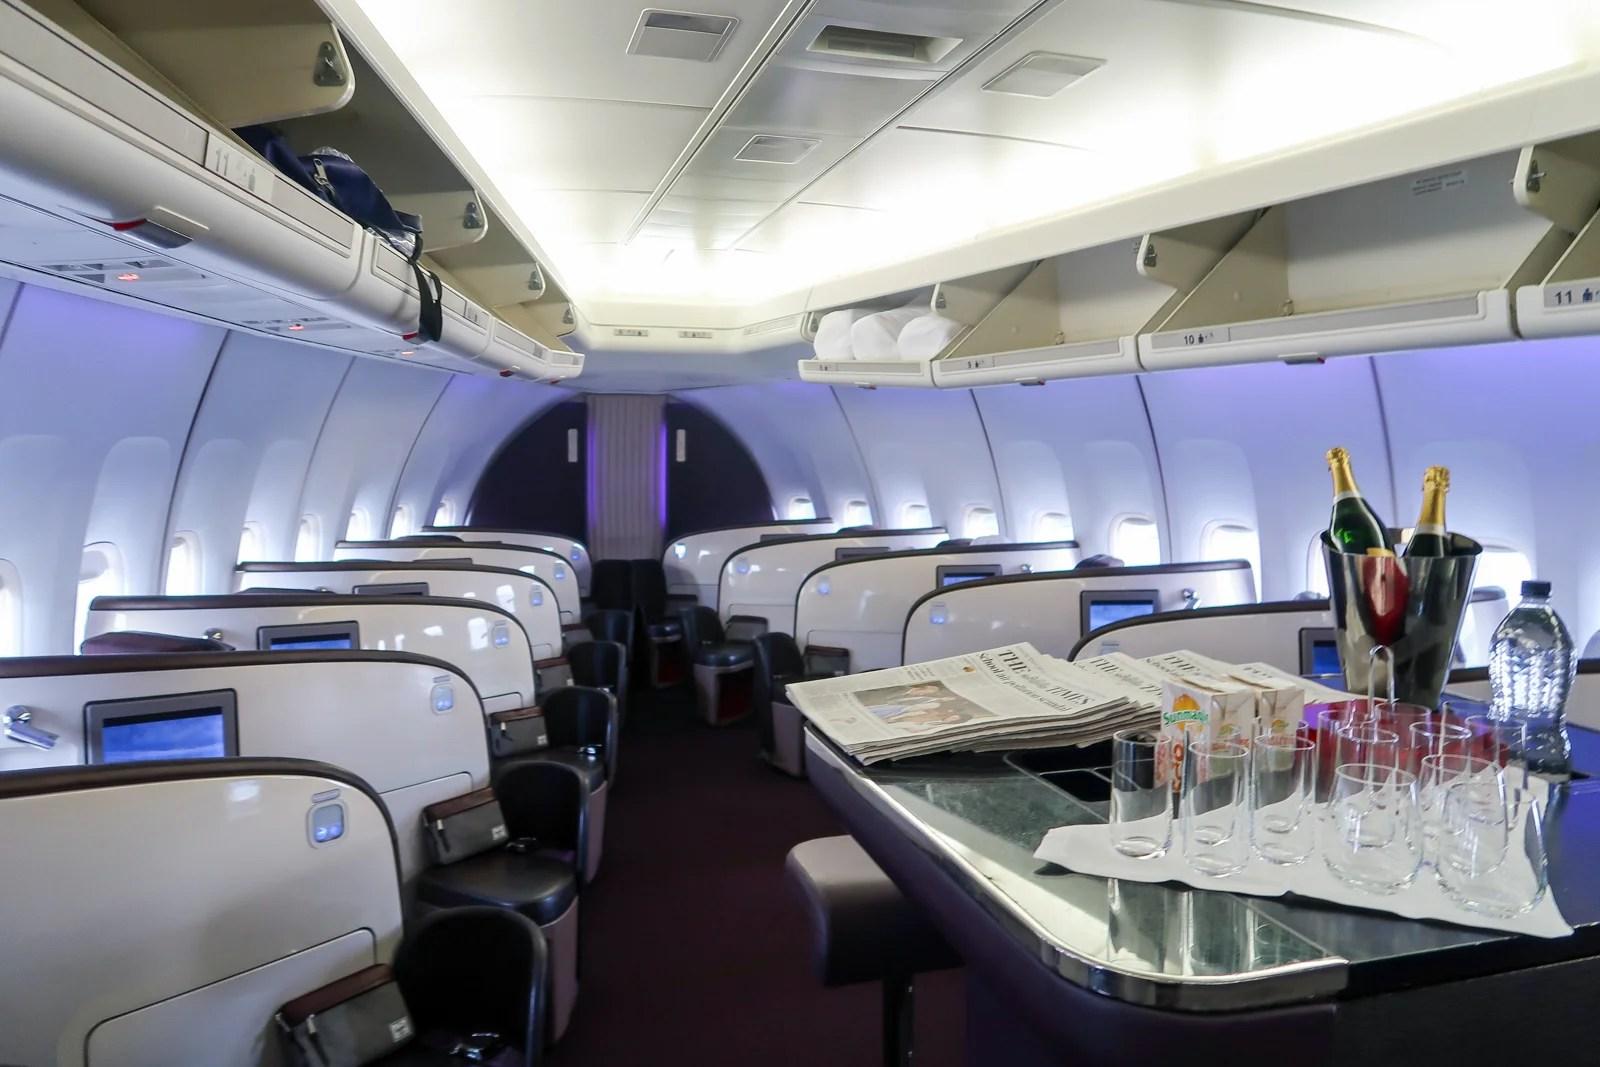 Review: Virgin Atlantic 747 Upper Class MAN-ATL